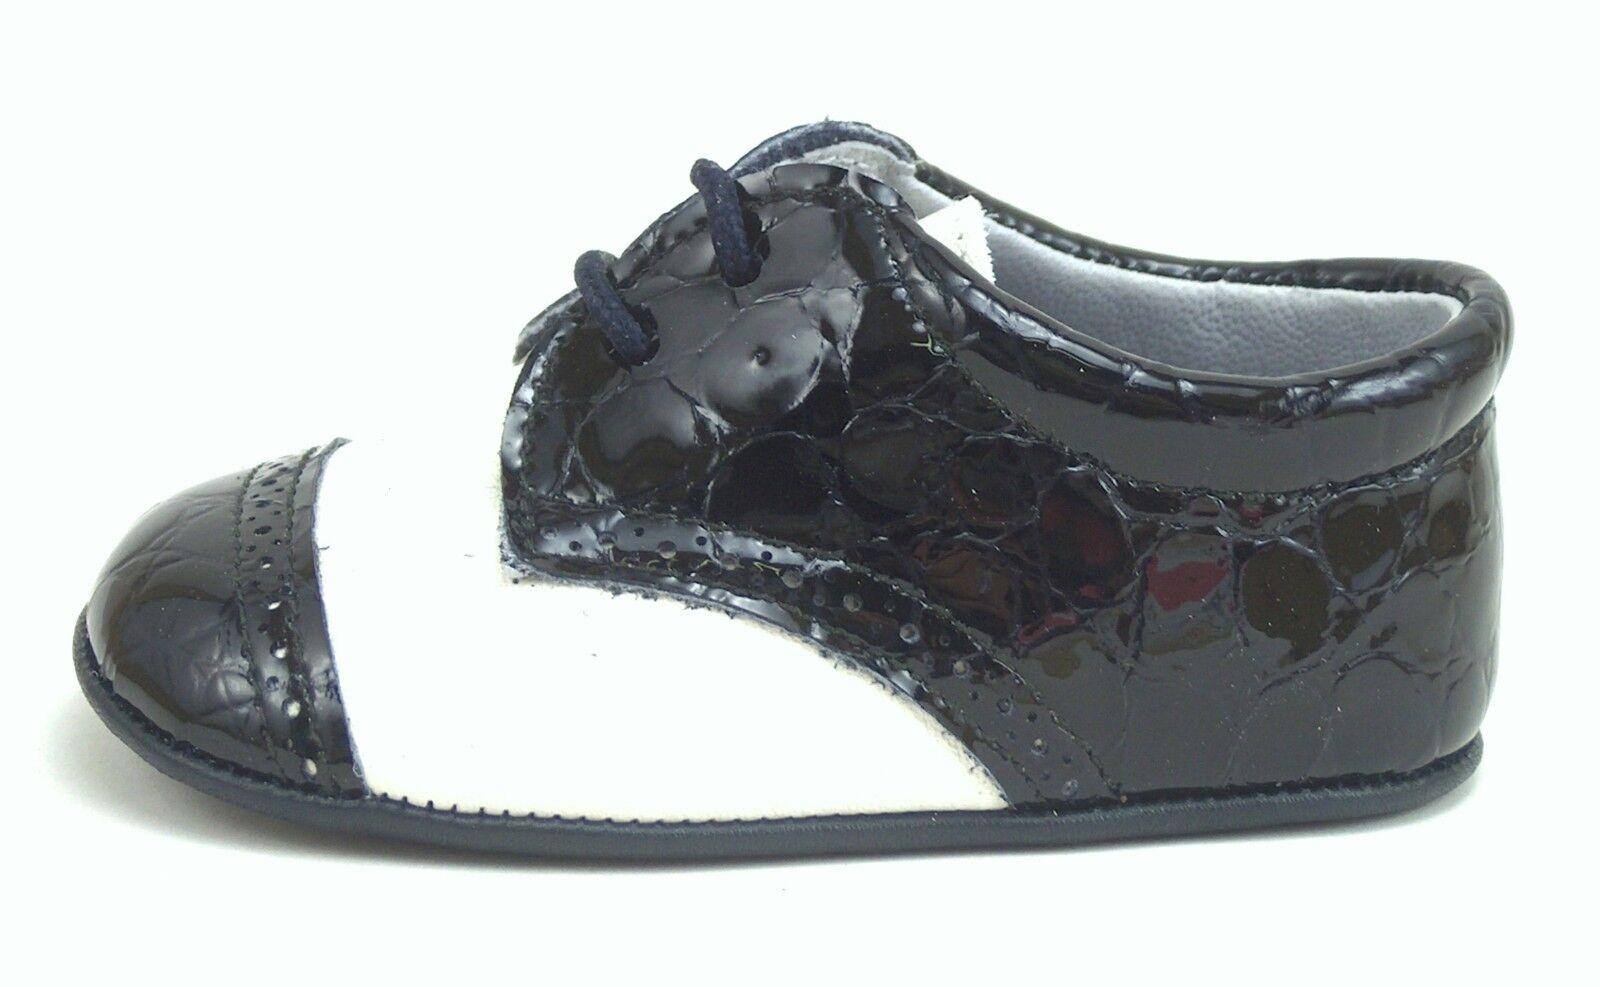 DE OSU - Baby Boys Euro Ivory Navy Croc Dress Crib Shoes DO-136 - Size 0 Size 2  1